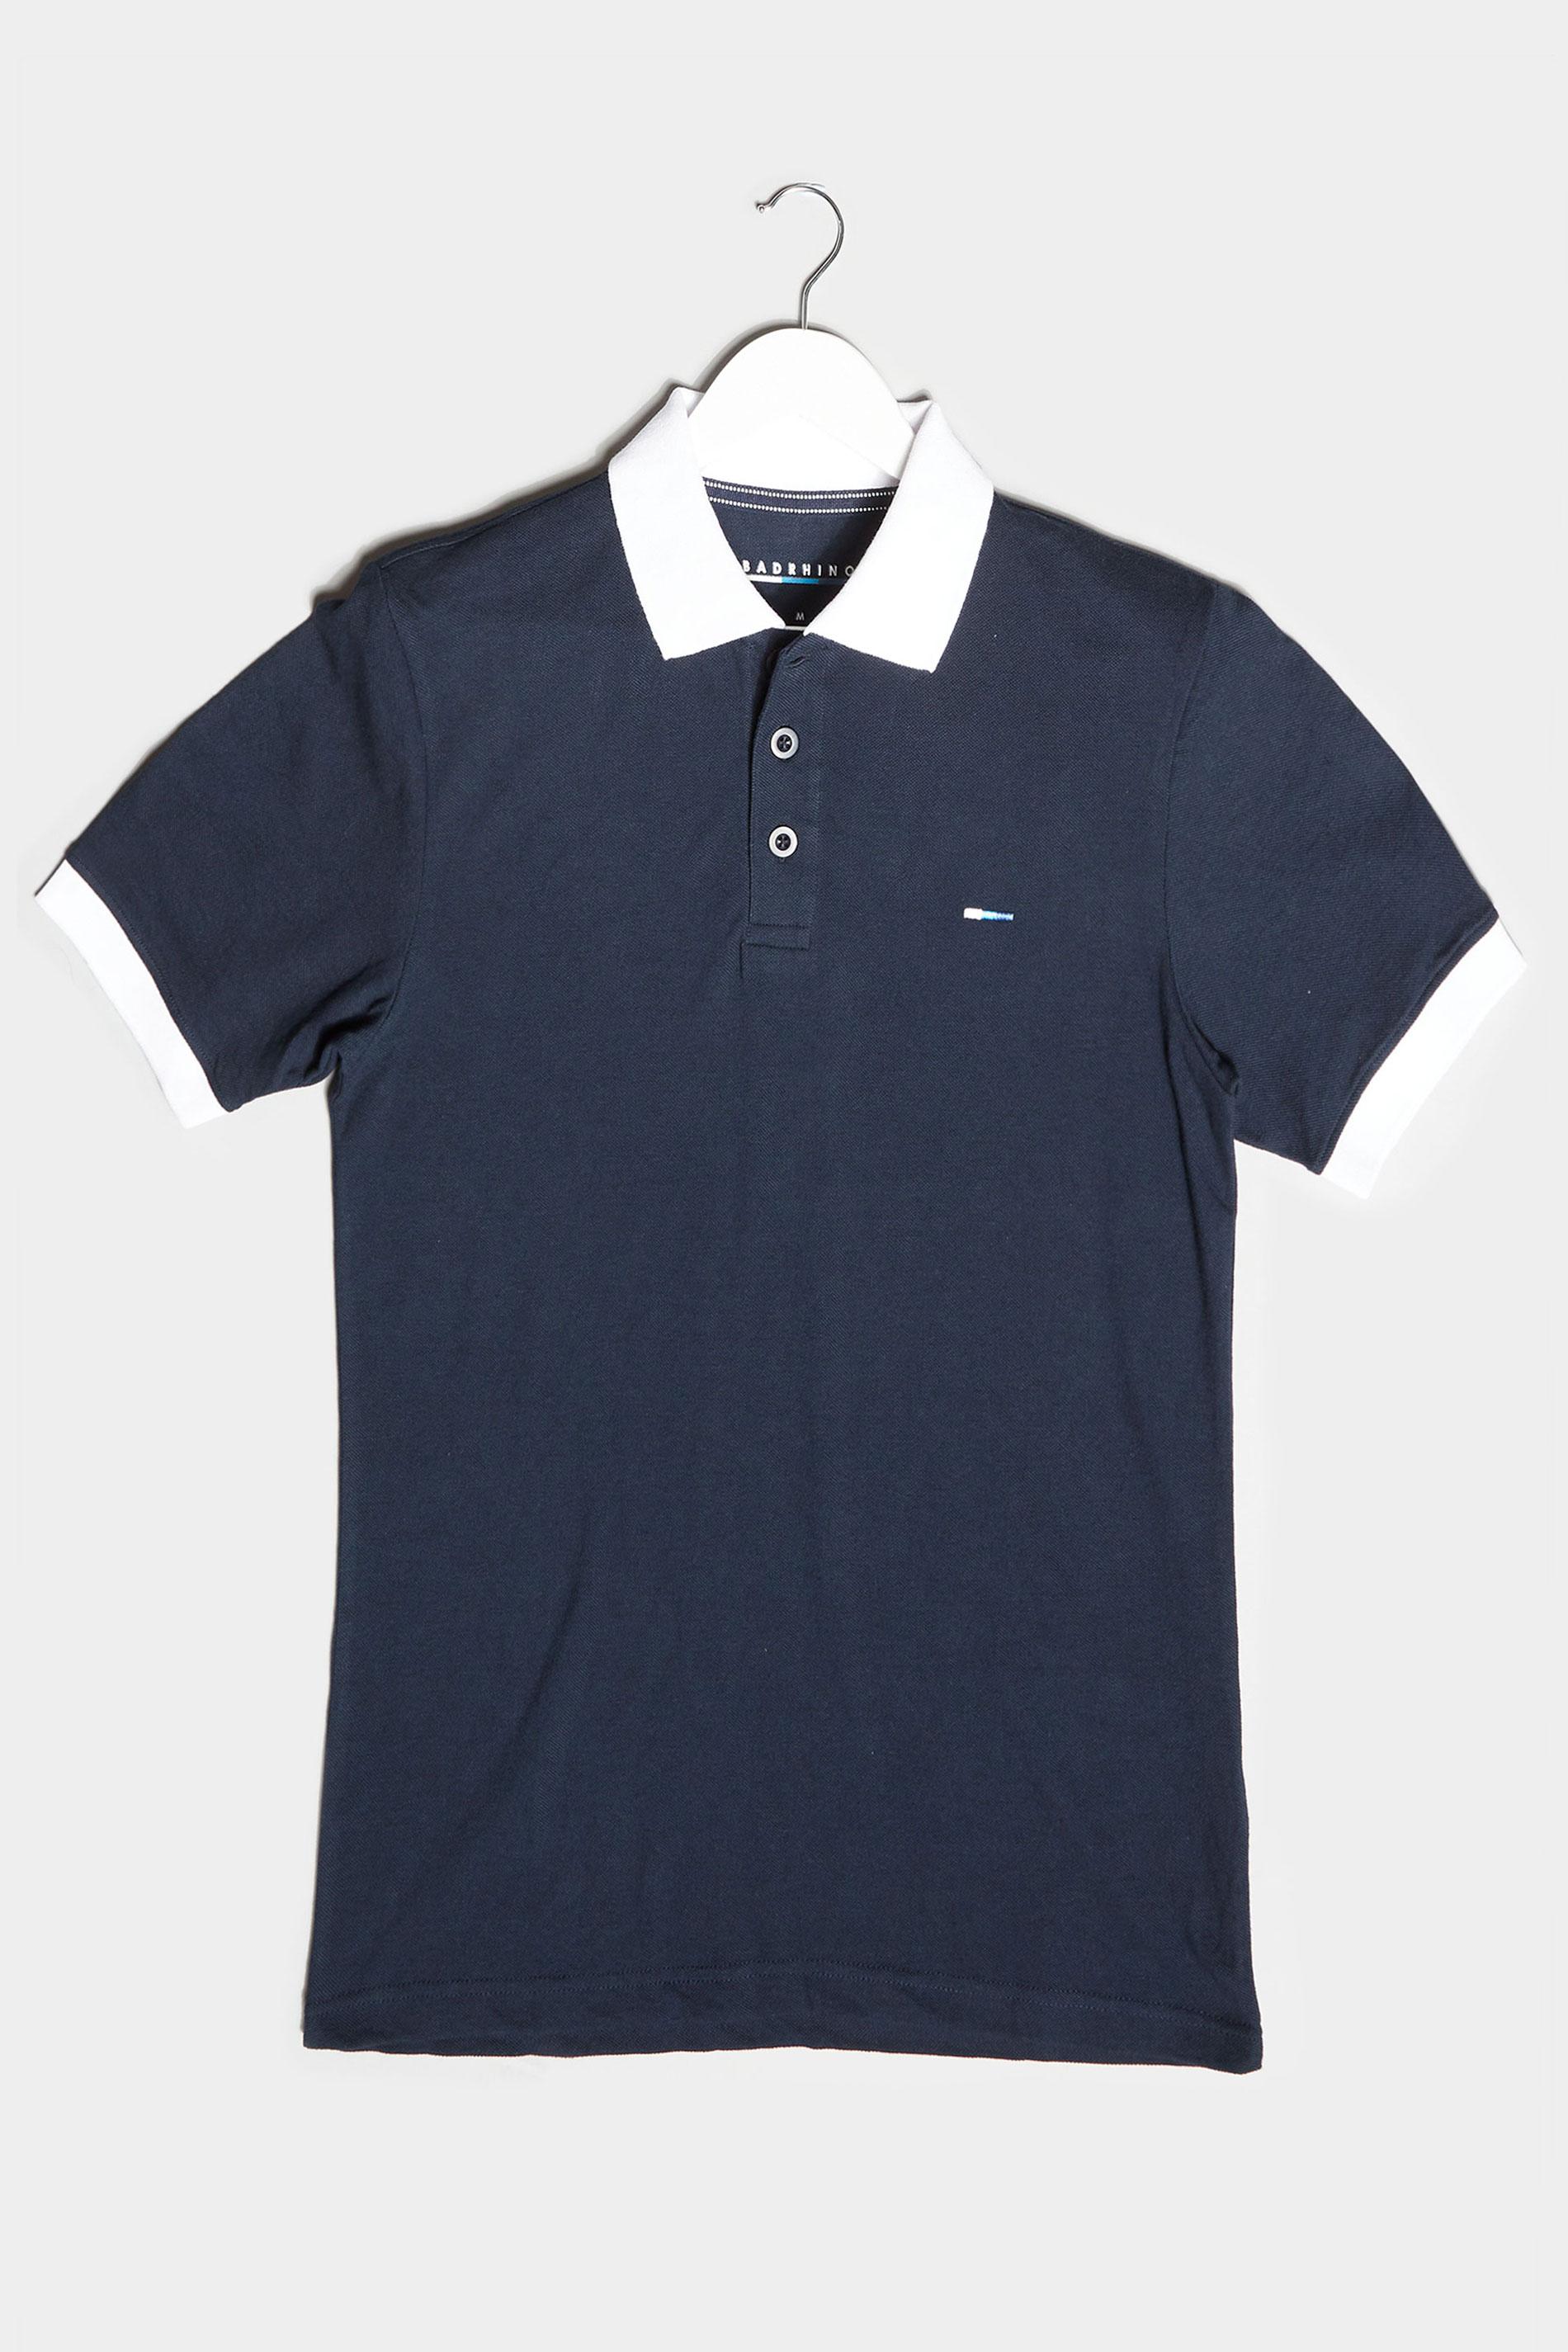 BadRhino Navy & White Contrast Polo Shirt